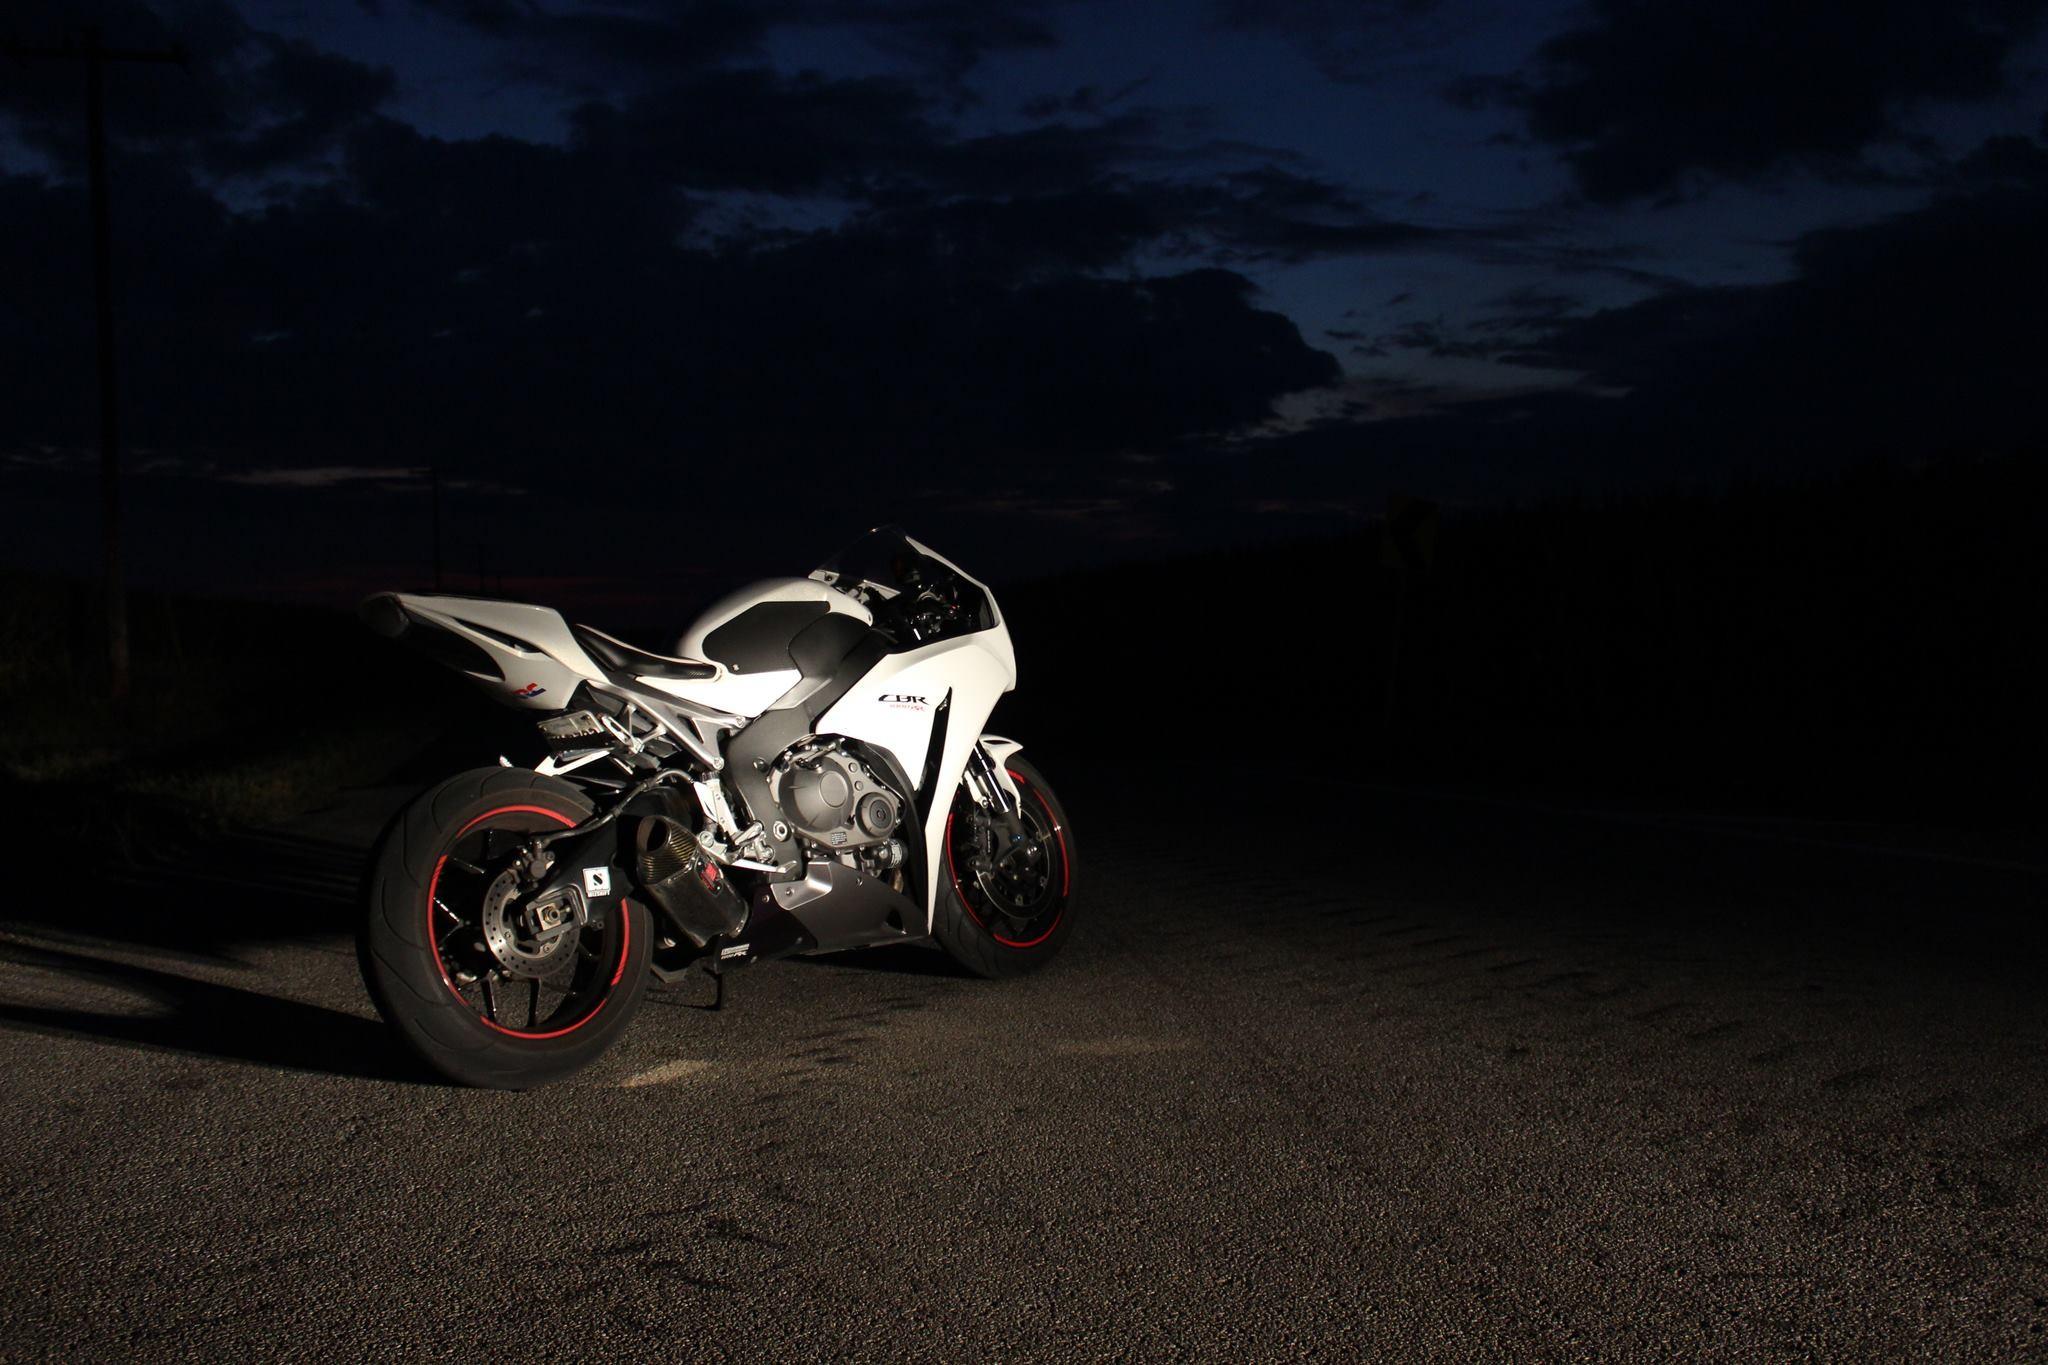 Car Motorcycle Vehicle Honda Cbr 1000 Rr Darkness Screenshot 2048x1365 Px Computer Wallpaper Land